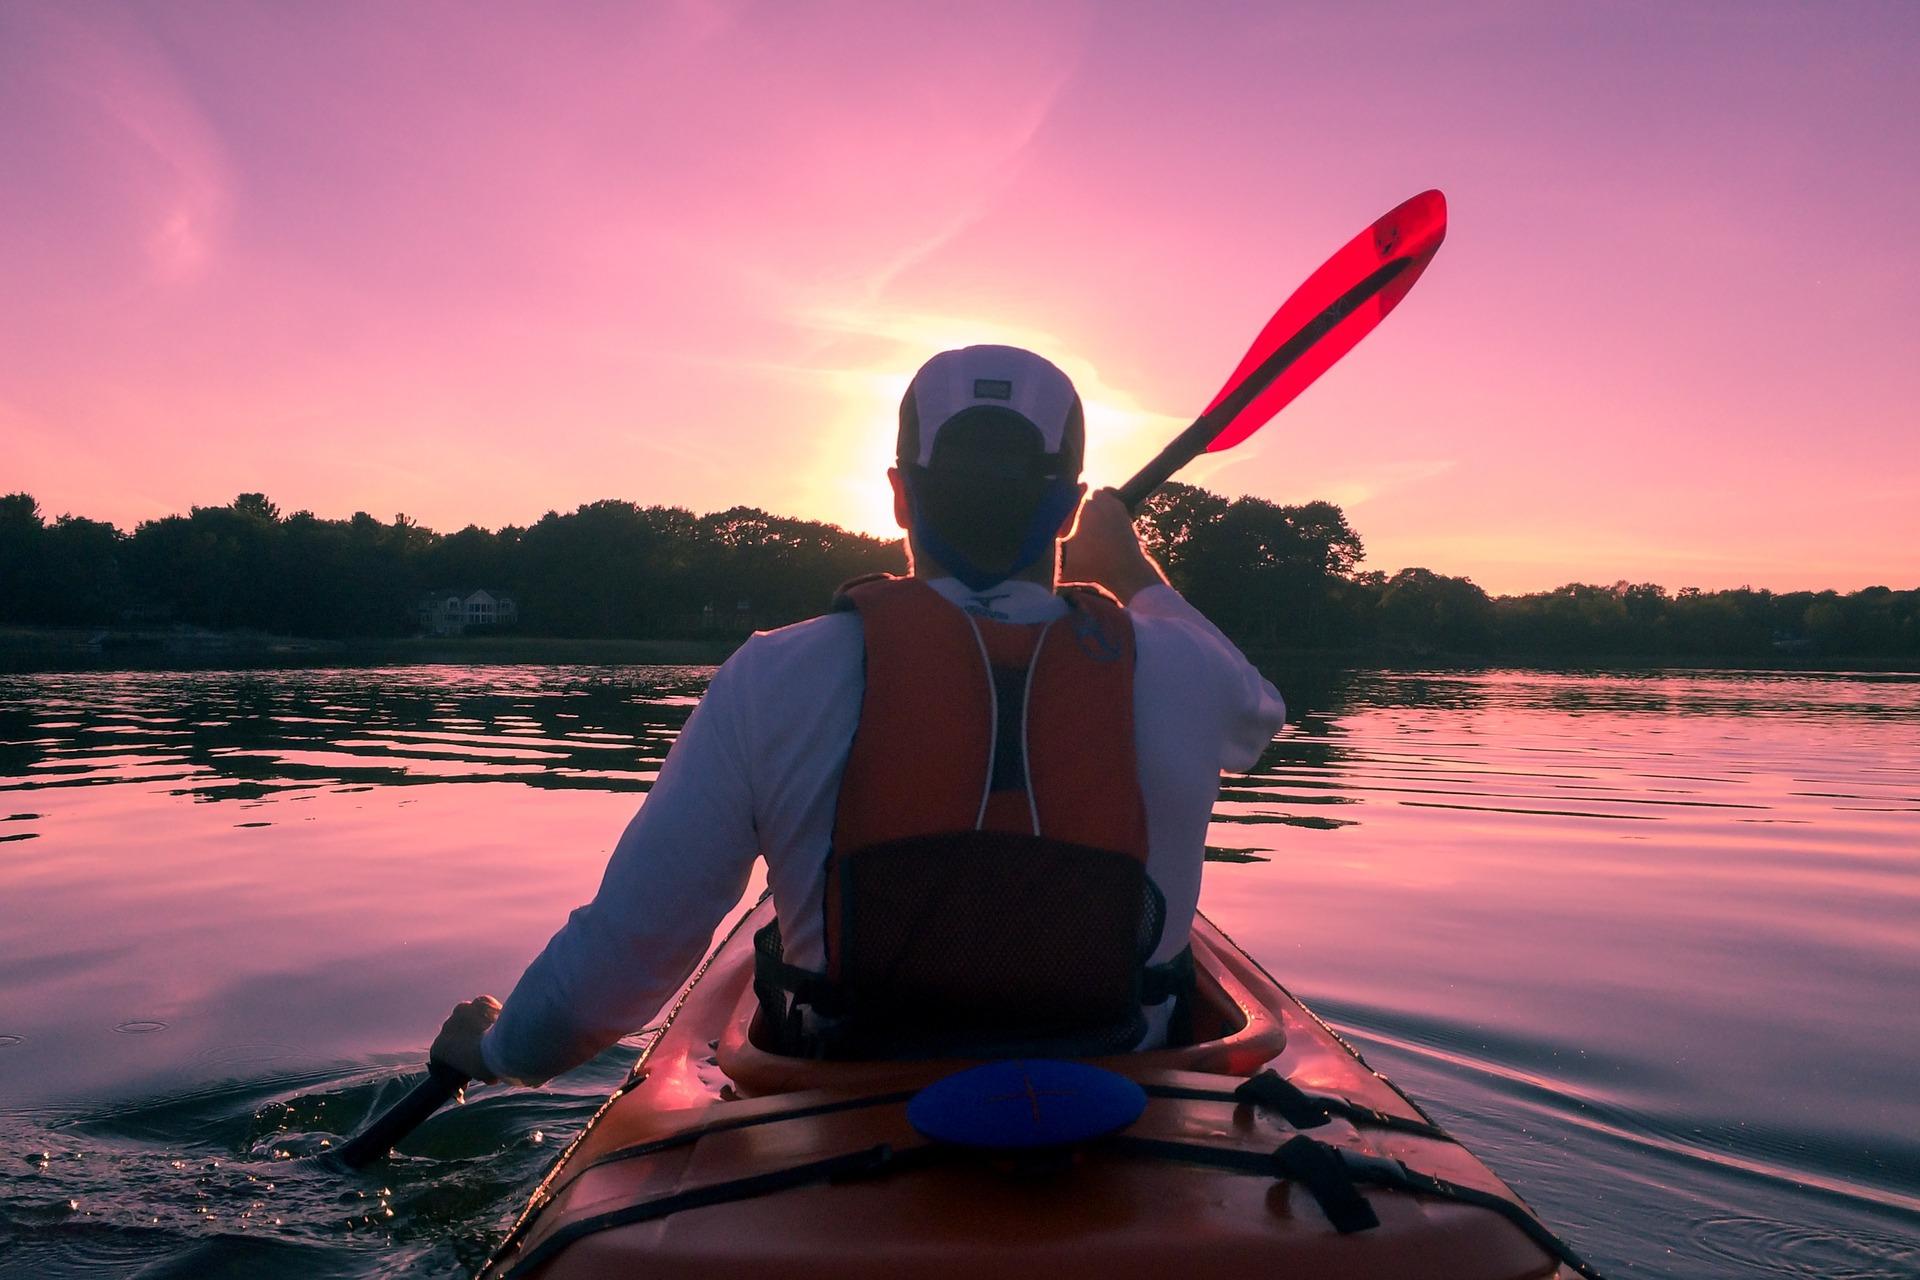 meilleur canoe-kayak gonflable